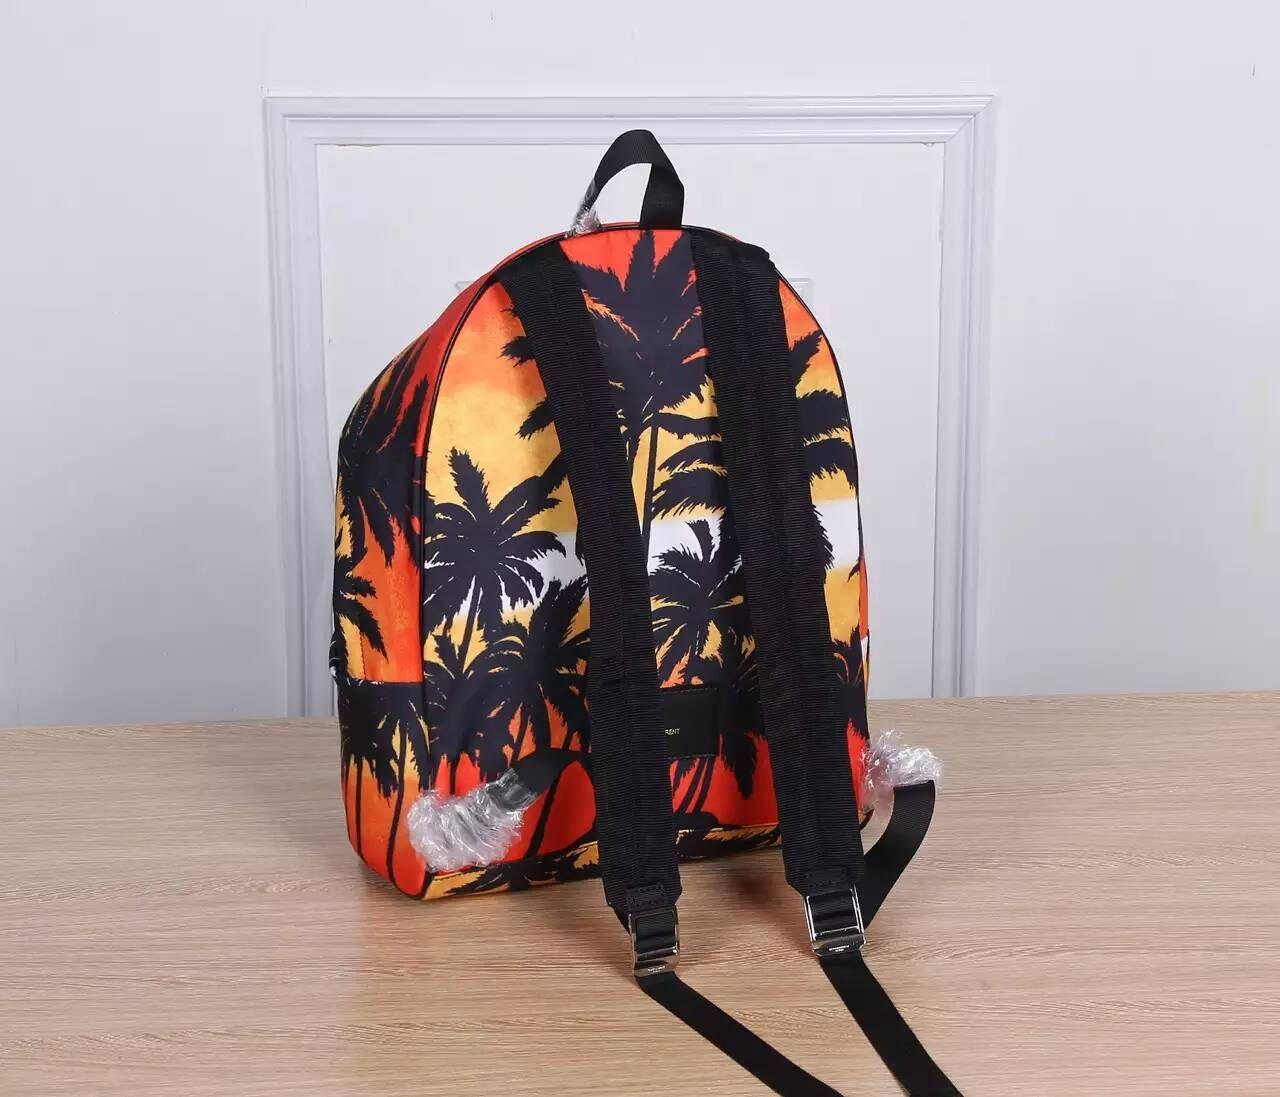 ... Stylish Coconut Tree Custom Printed Luxury Backpacks for Men Print Rucksack Travel Pack Laptop Bagpack Backbag ... & Stylish Coconut Tree Custom Printed Luxury Backpacks For Men Print ...